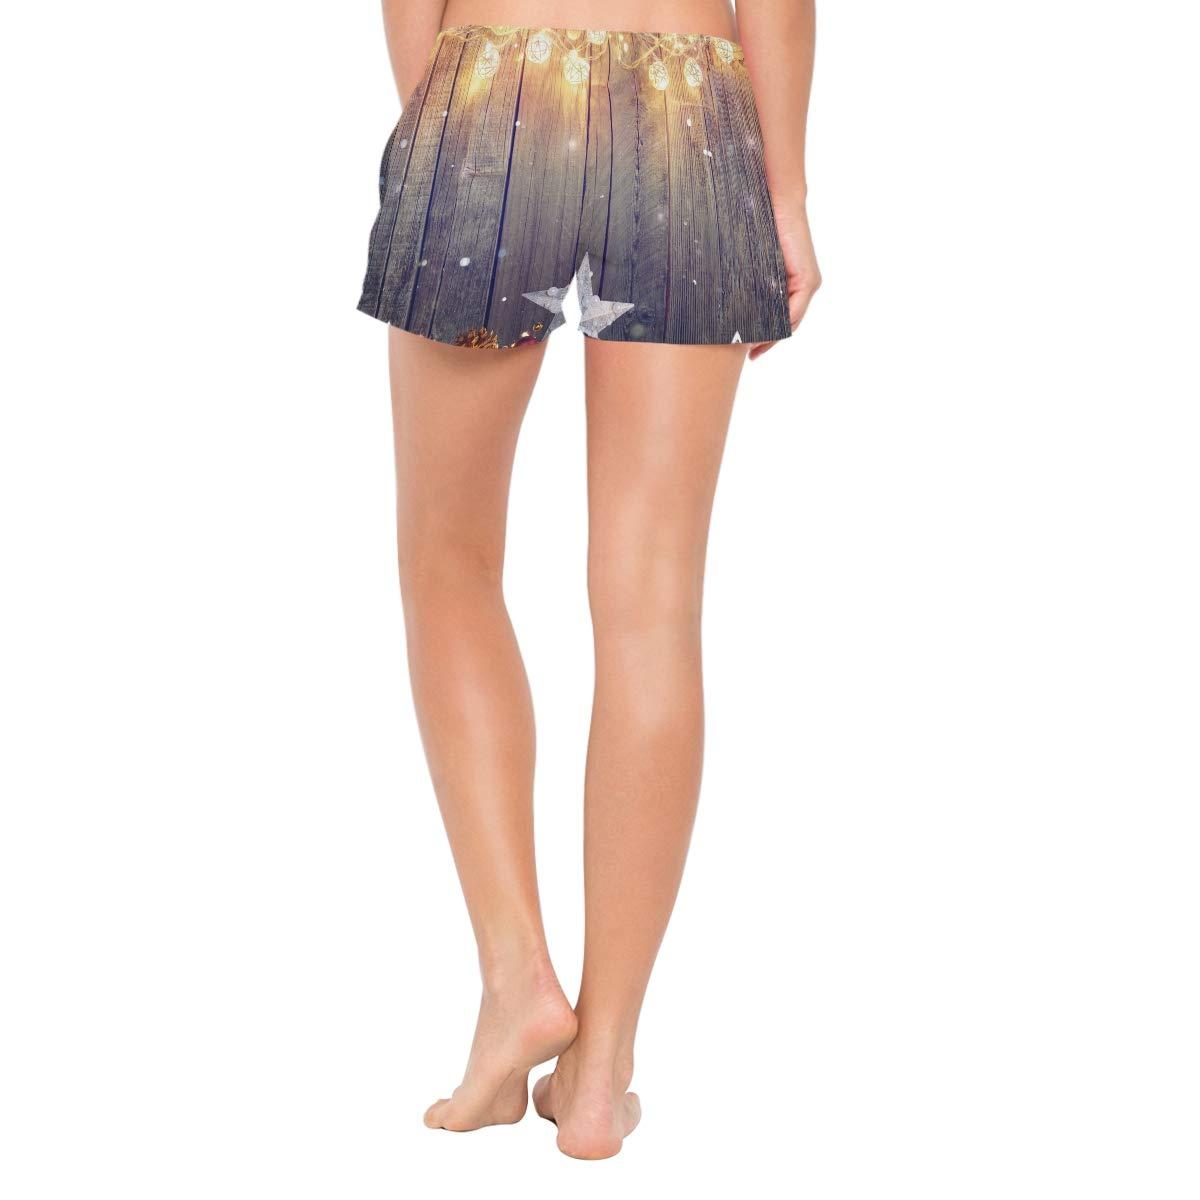 NWTSPY Star Light Womens Sport Beach Swim Shorts Board Shorts Swimsuit with Mesh Lining